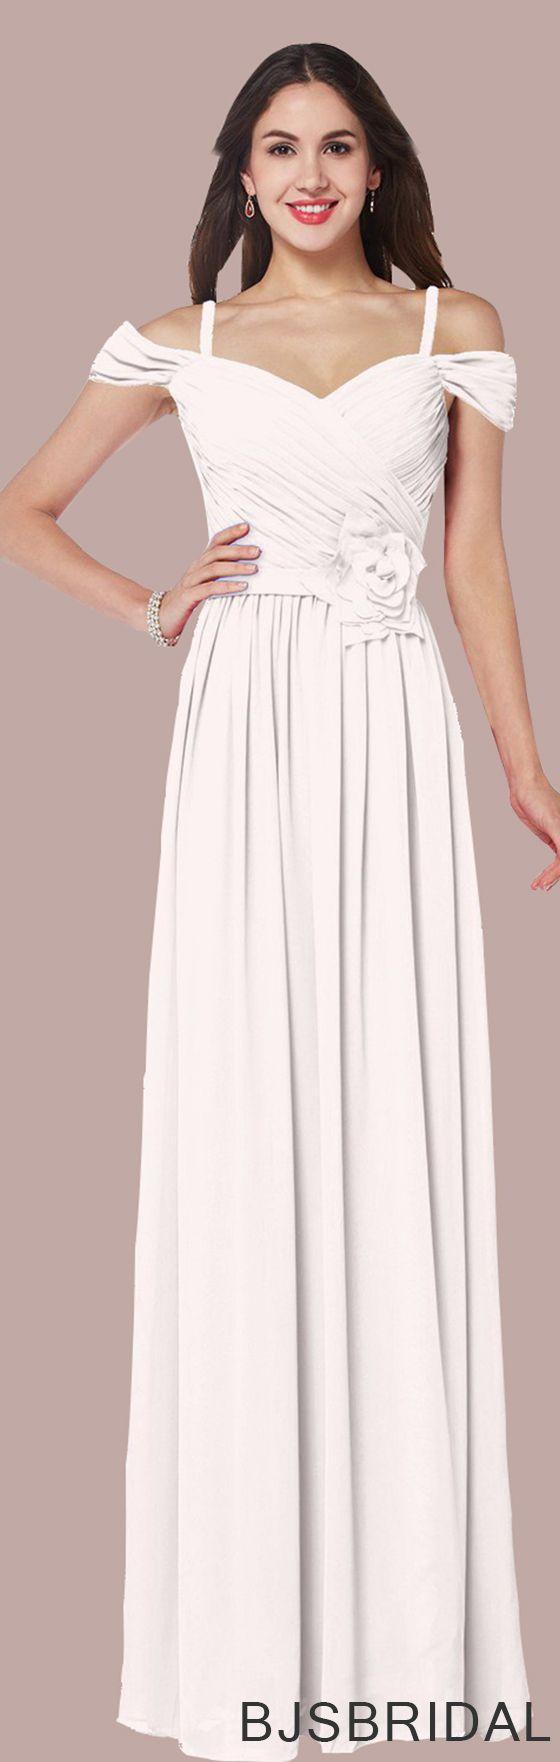 The 25 best light pink bridesmaid dresses ideas on pinterest bjsbridal light pink bridesmaid dress ombrellifo Gallery